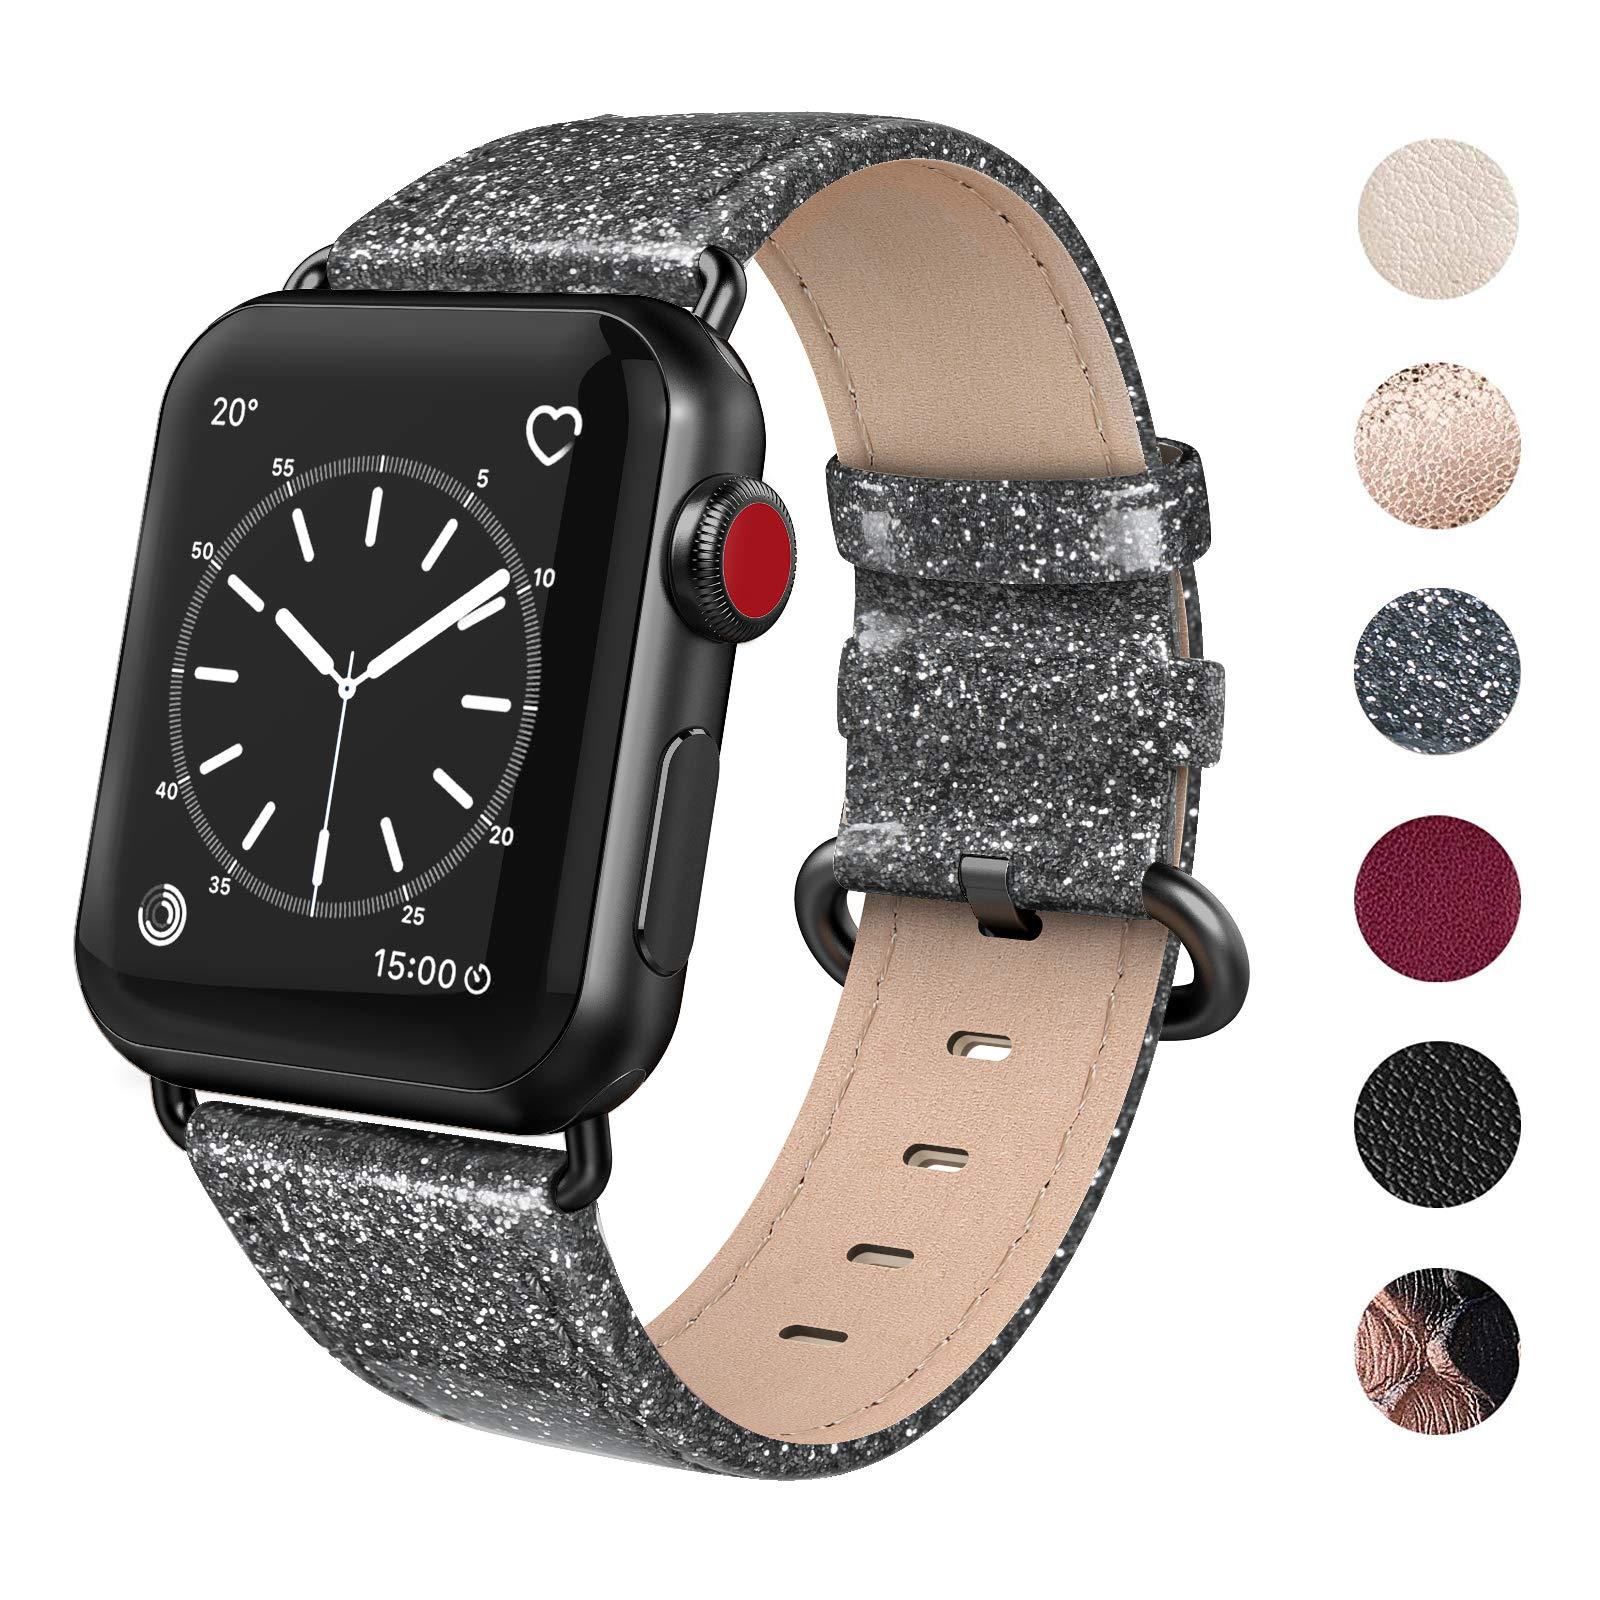 Malla Cuero para Apple Watch (38/40mm) SWEES [7FT43KHF]